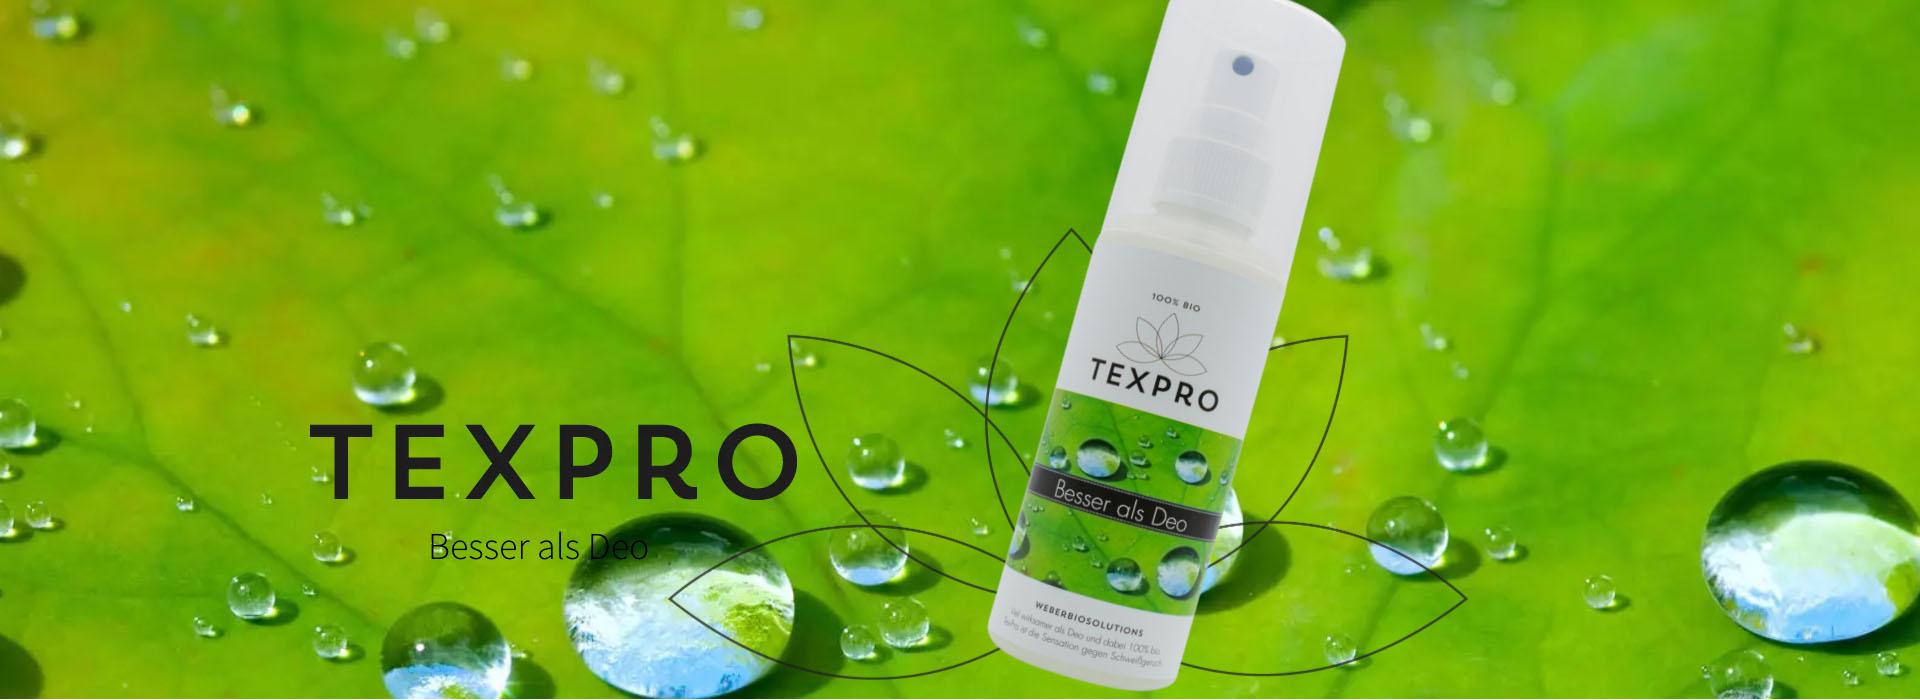 TEXPRO - besser als Deo